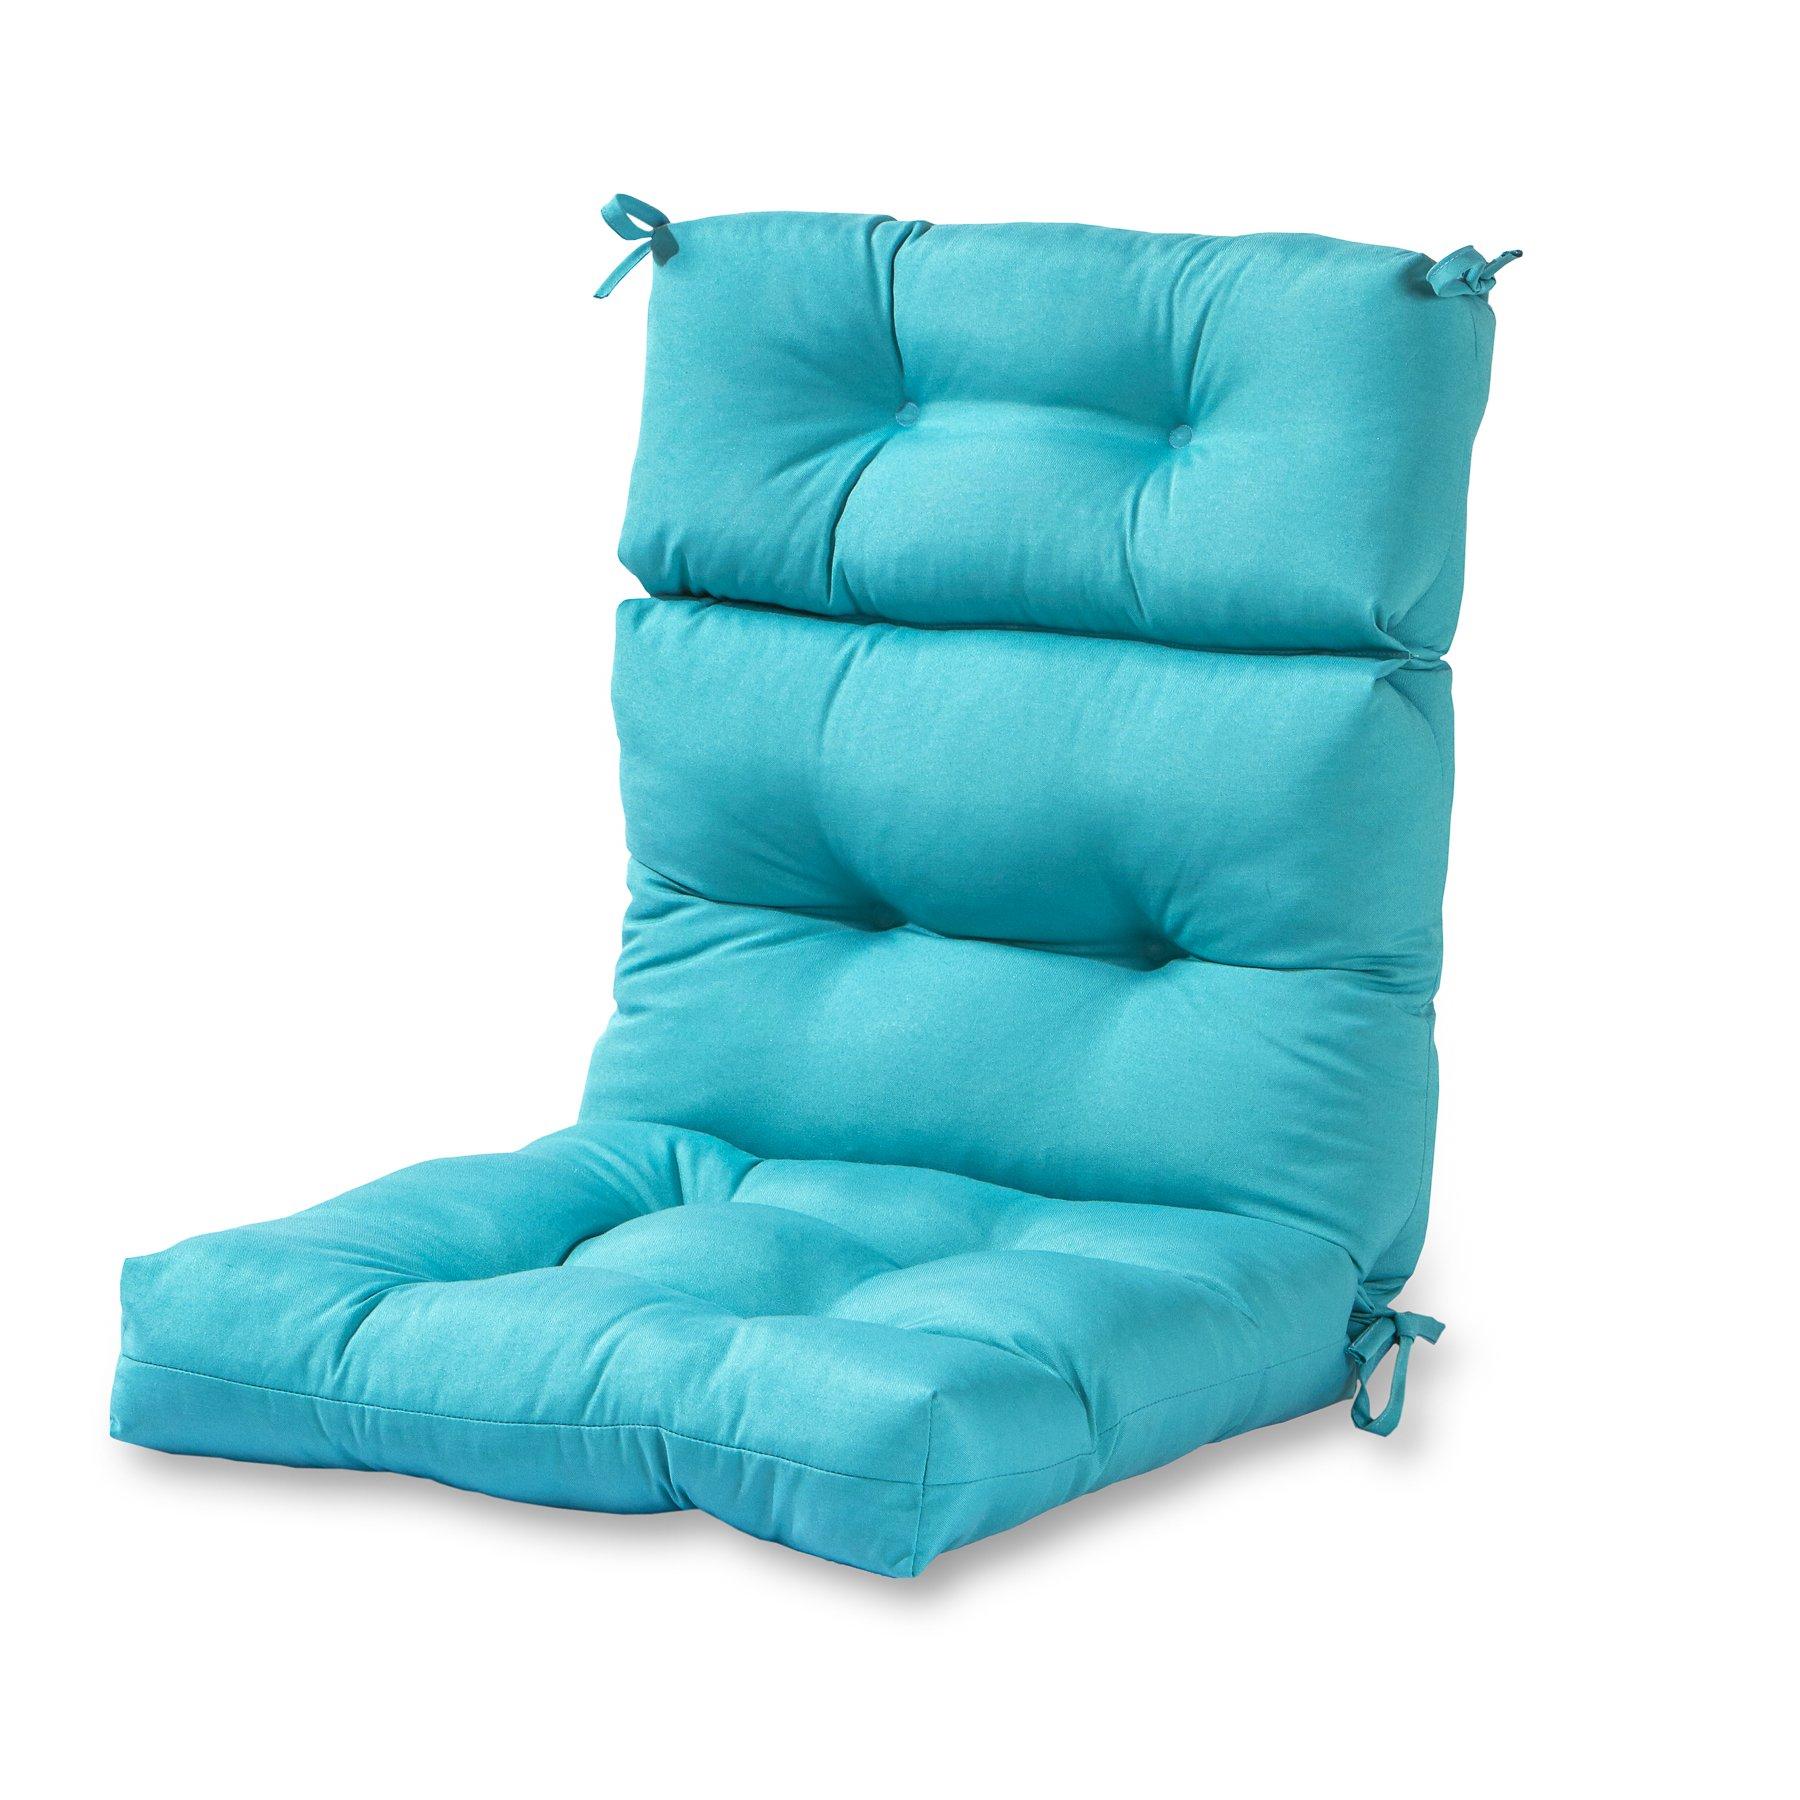 Greendale Home Fashions Outdoor High Back Chair Cushion, Teal